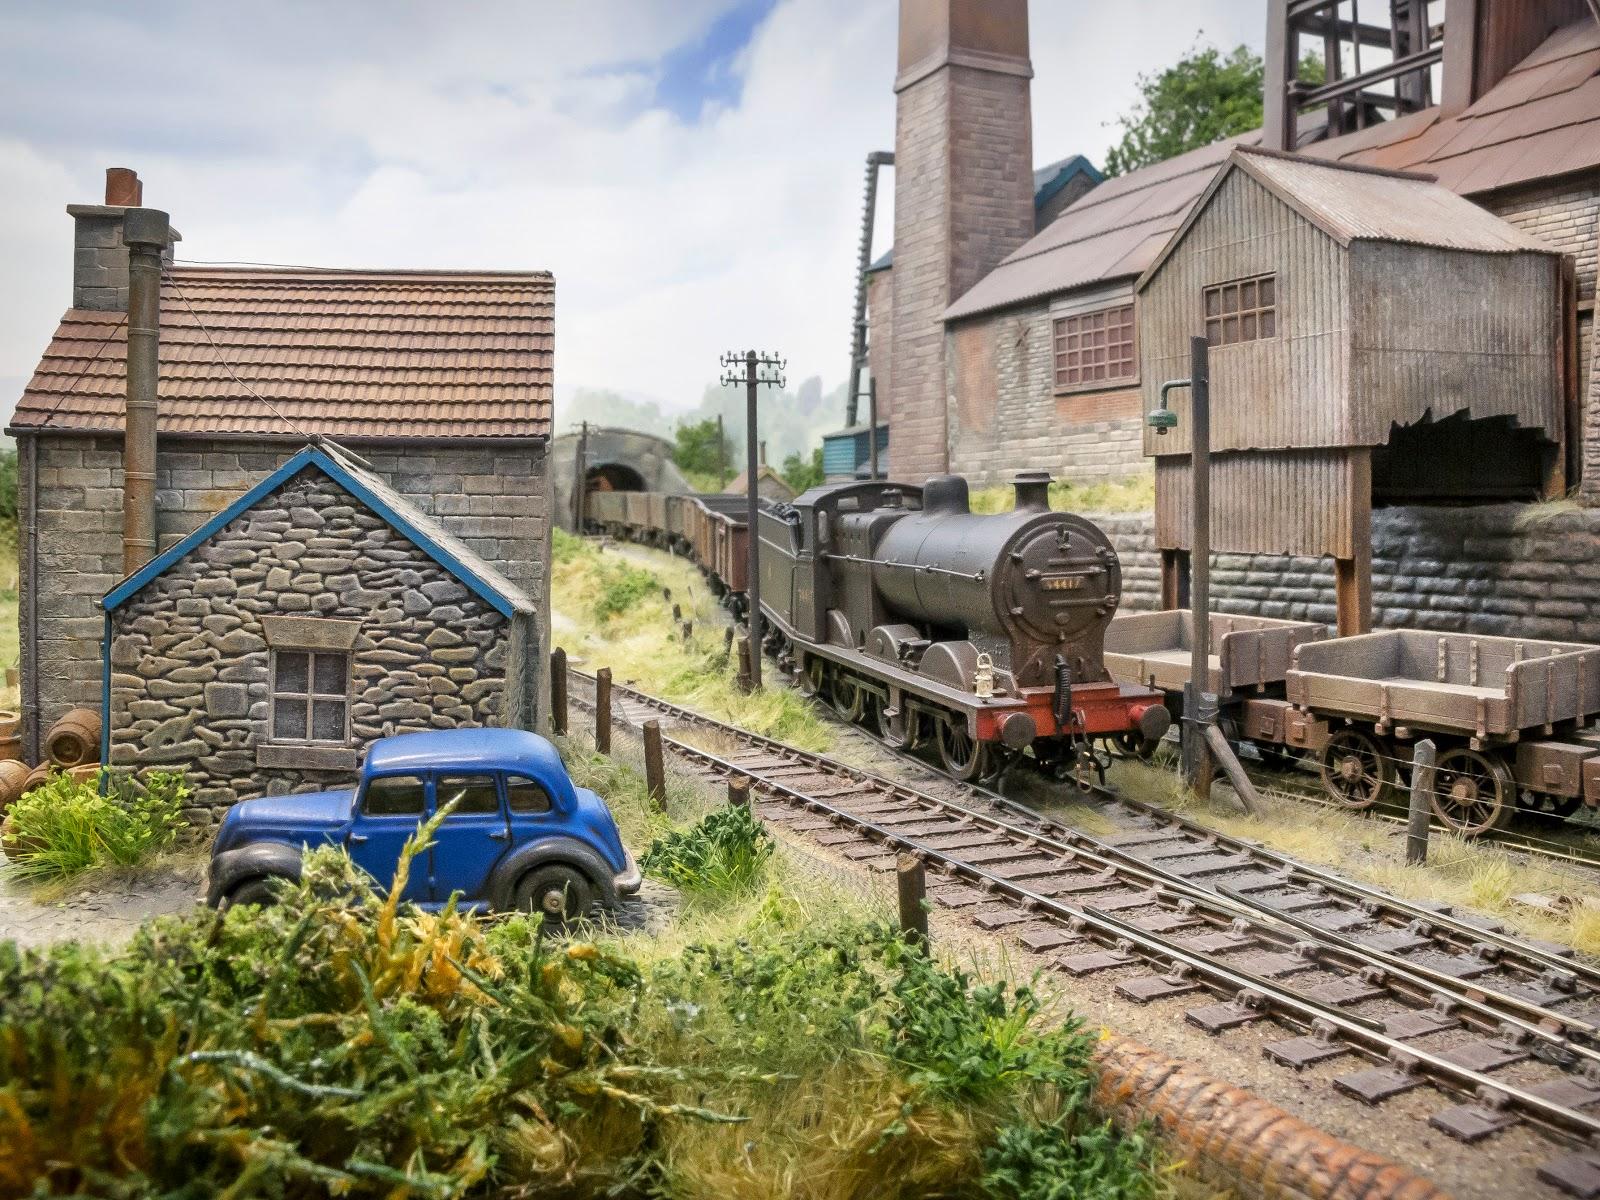 Chris Nevard Model Railways Blog: Rochdale Model Railway